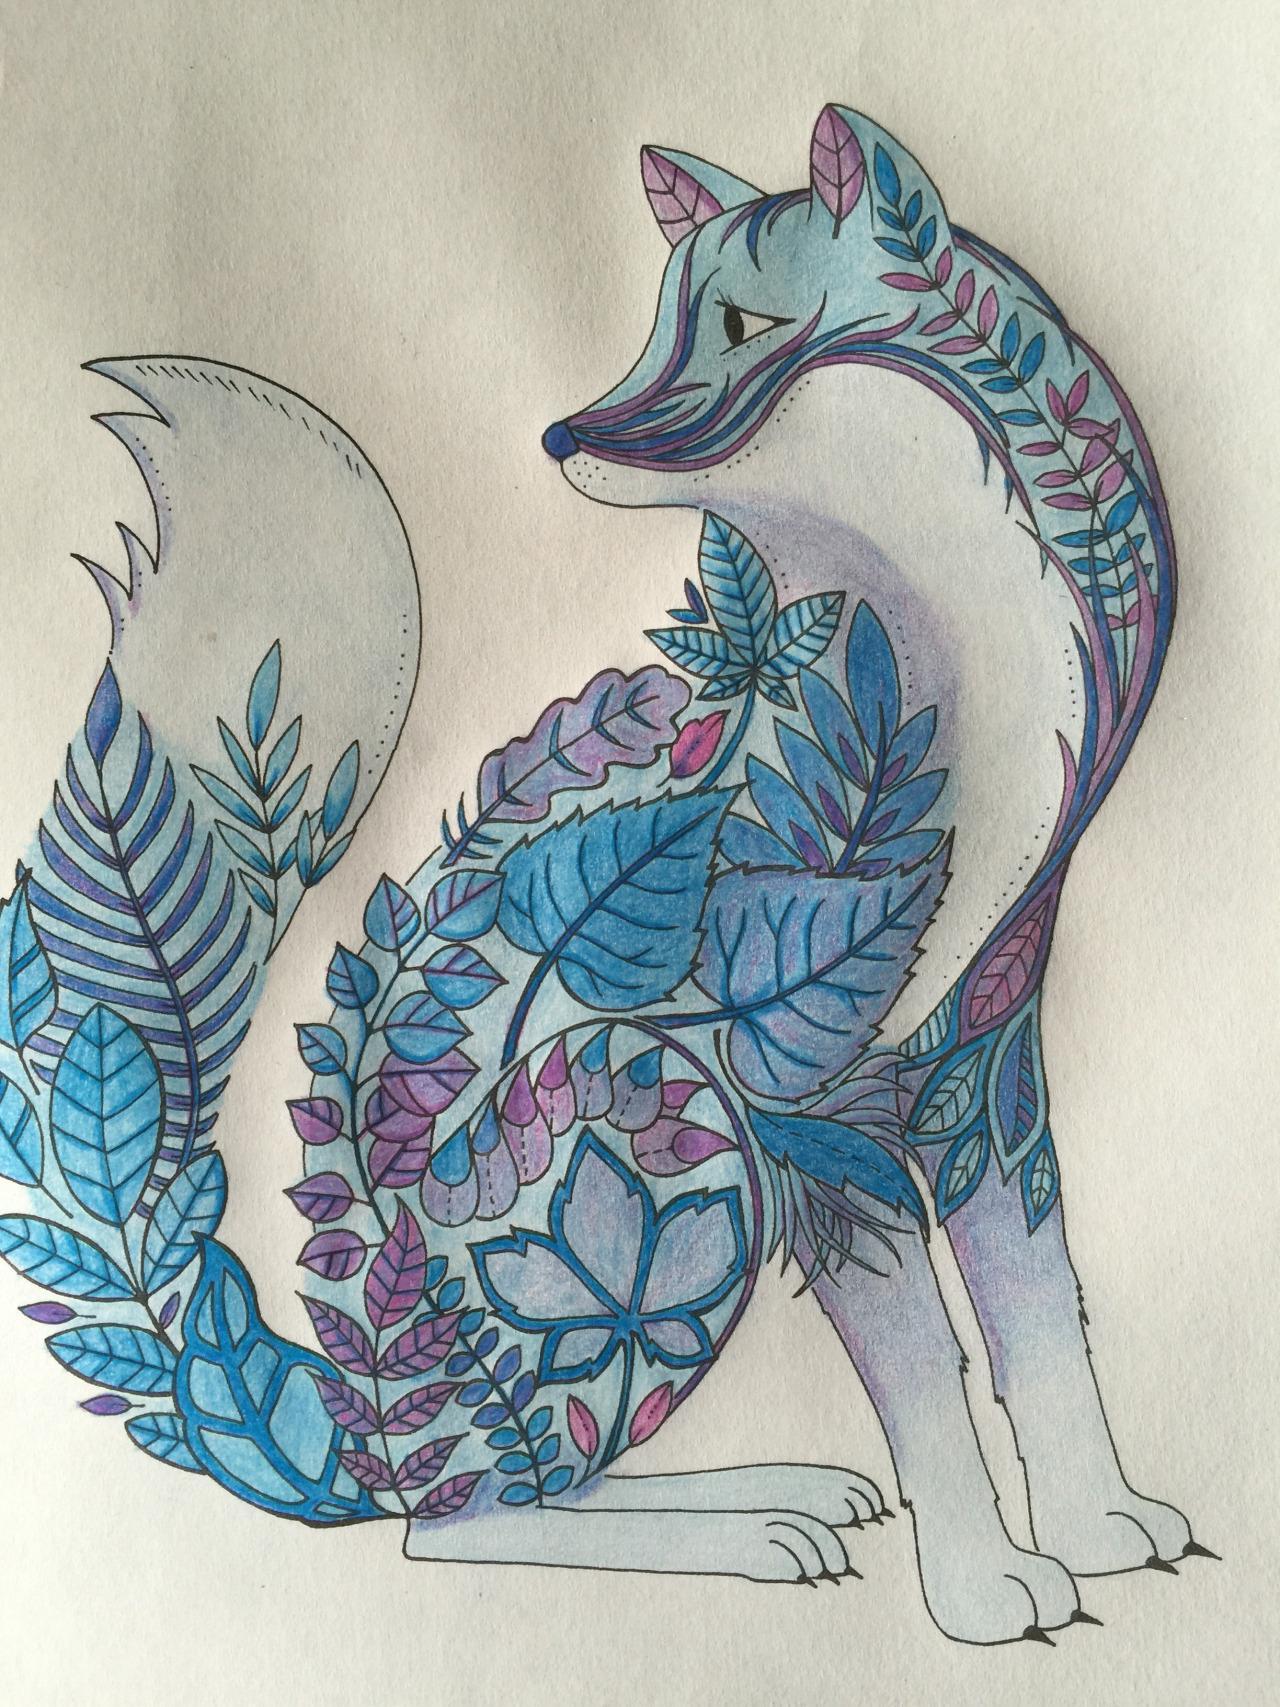 Dragon Tales Coloring Book Download